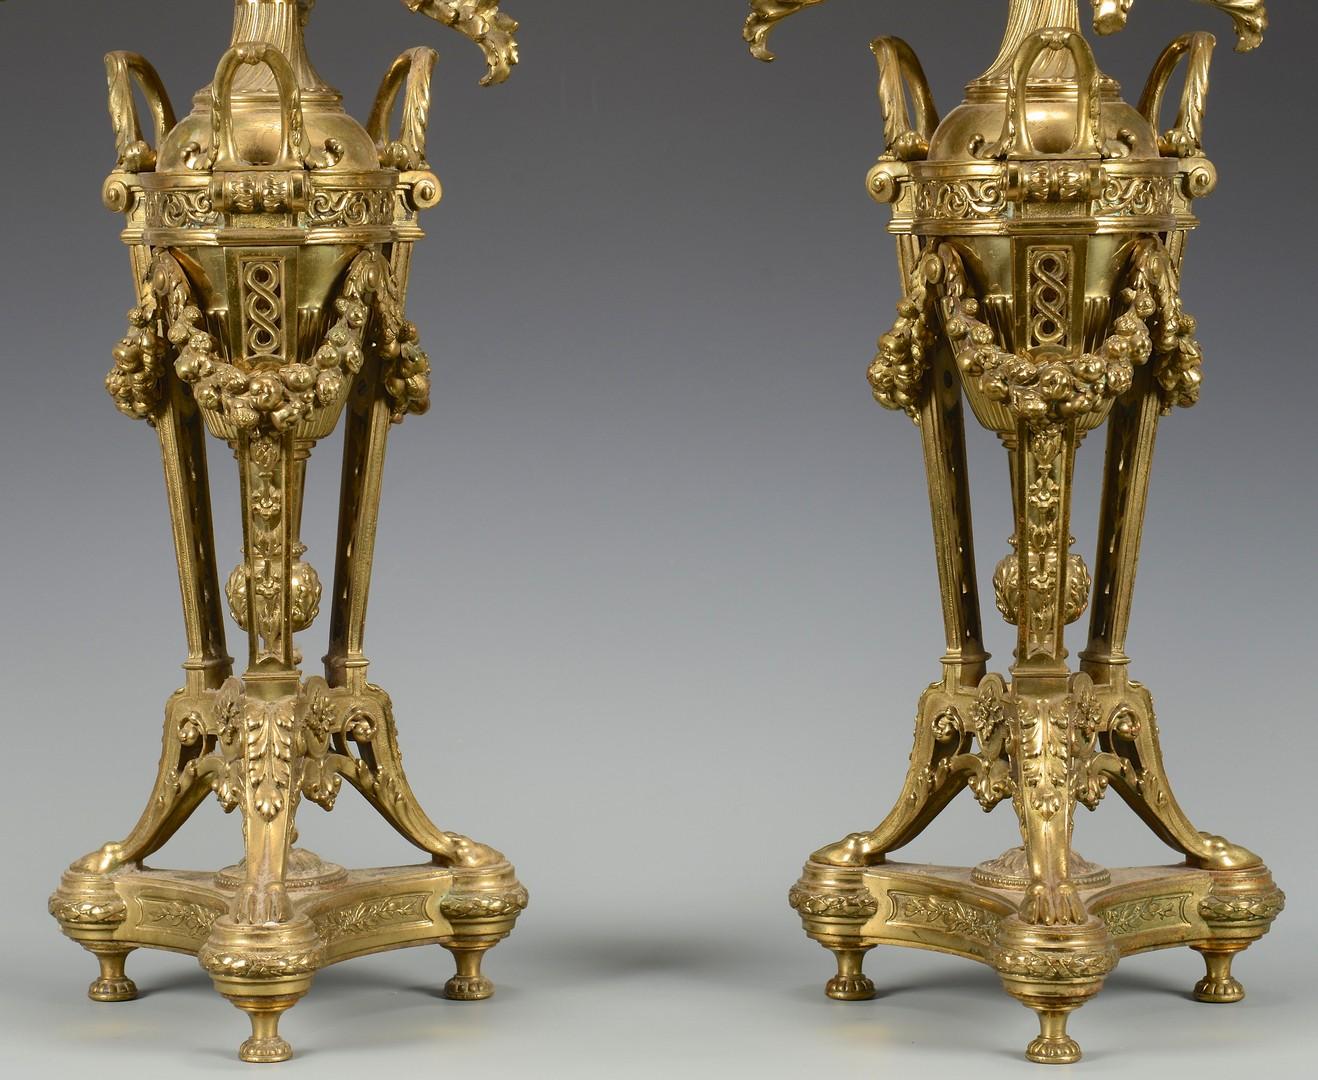 Lot 446: Pr. Empire Style Ormolu Candelabra w/ Cherubs, Paw feet